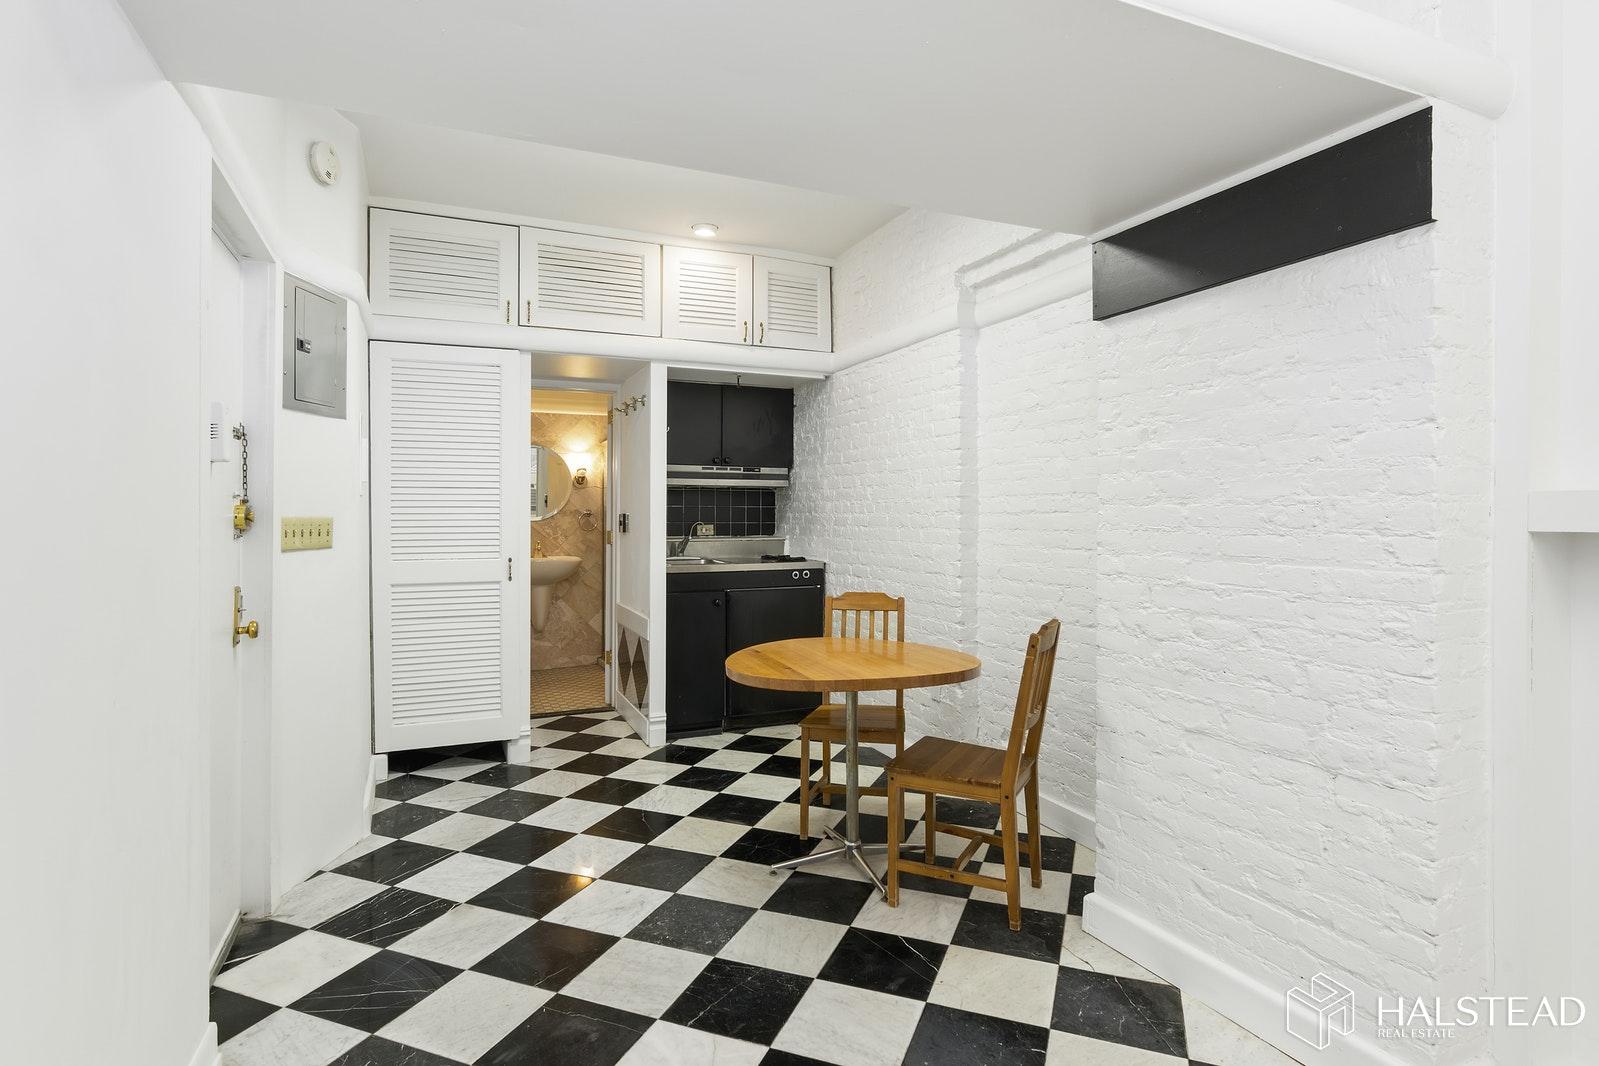 223 EAST 78TH STREET 1B, Upper East Side, $299,000, Web #: 19848148